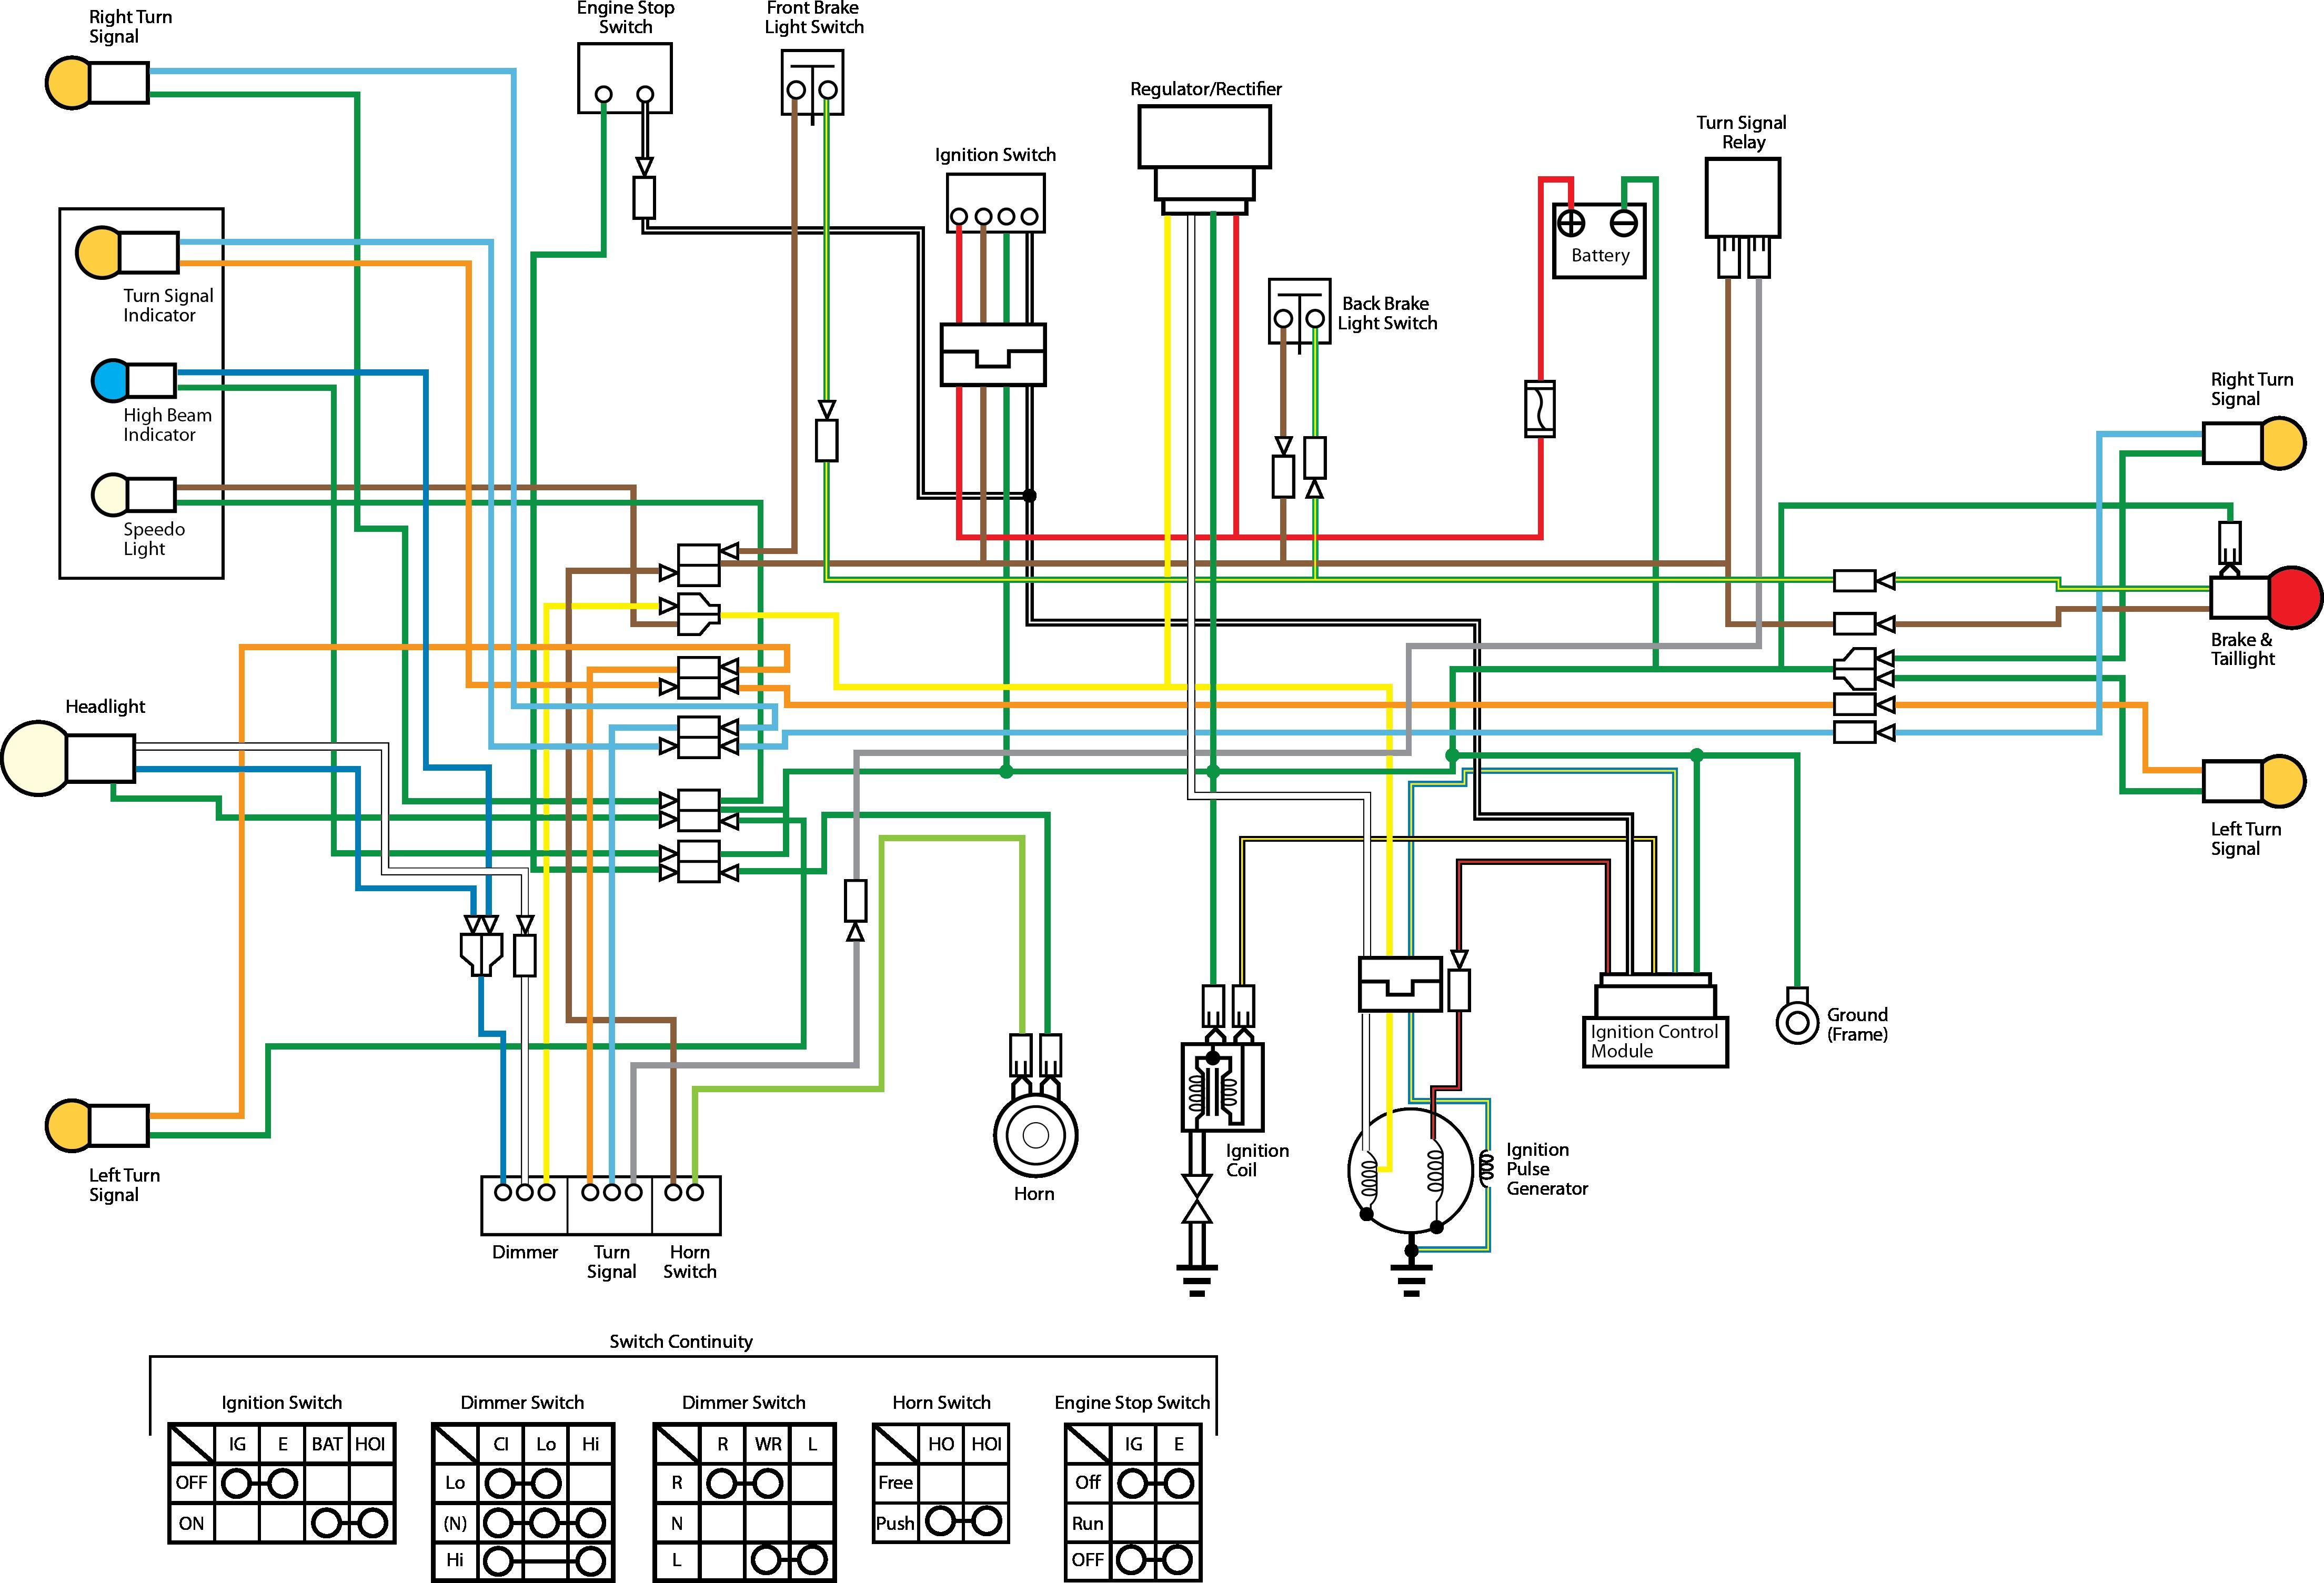 Brake Lights Diagram Index 0 0d – Wiring Diagram Collection Of Brake Lights Diagram